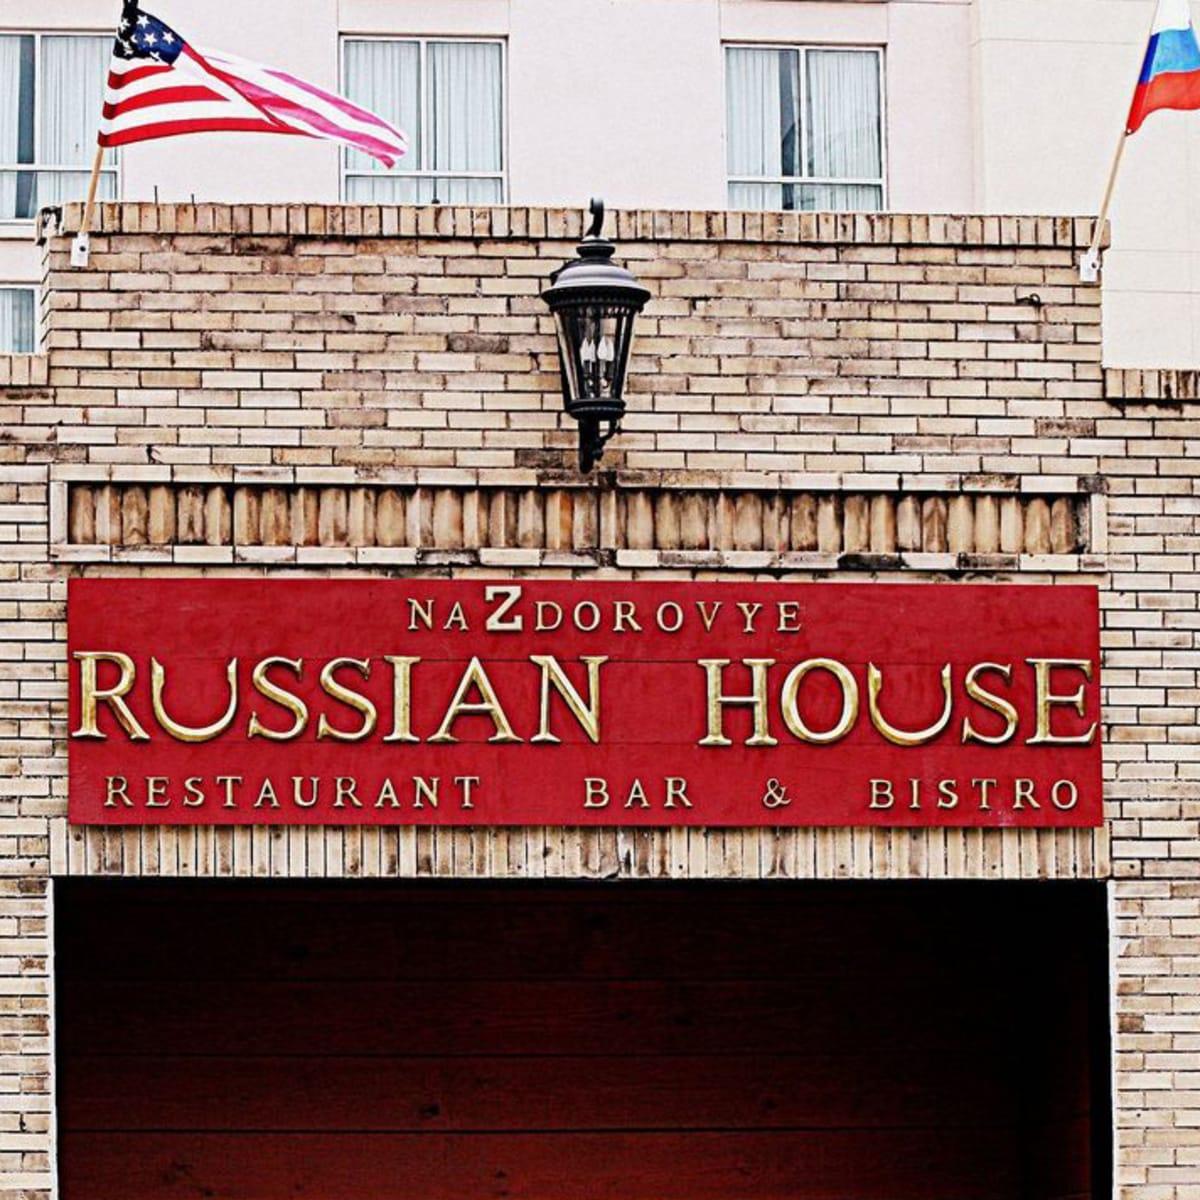 Austin Photo Set: News_Samantha_the russian house_dec 2012_11